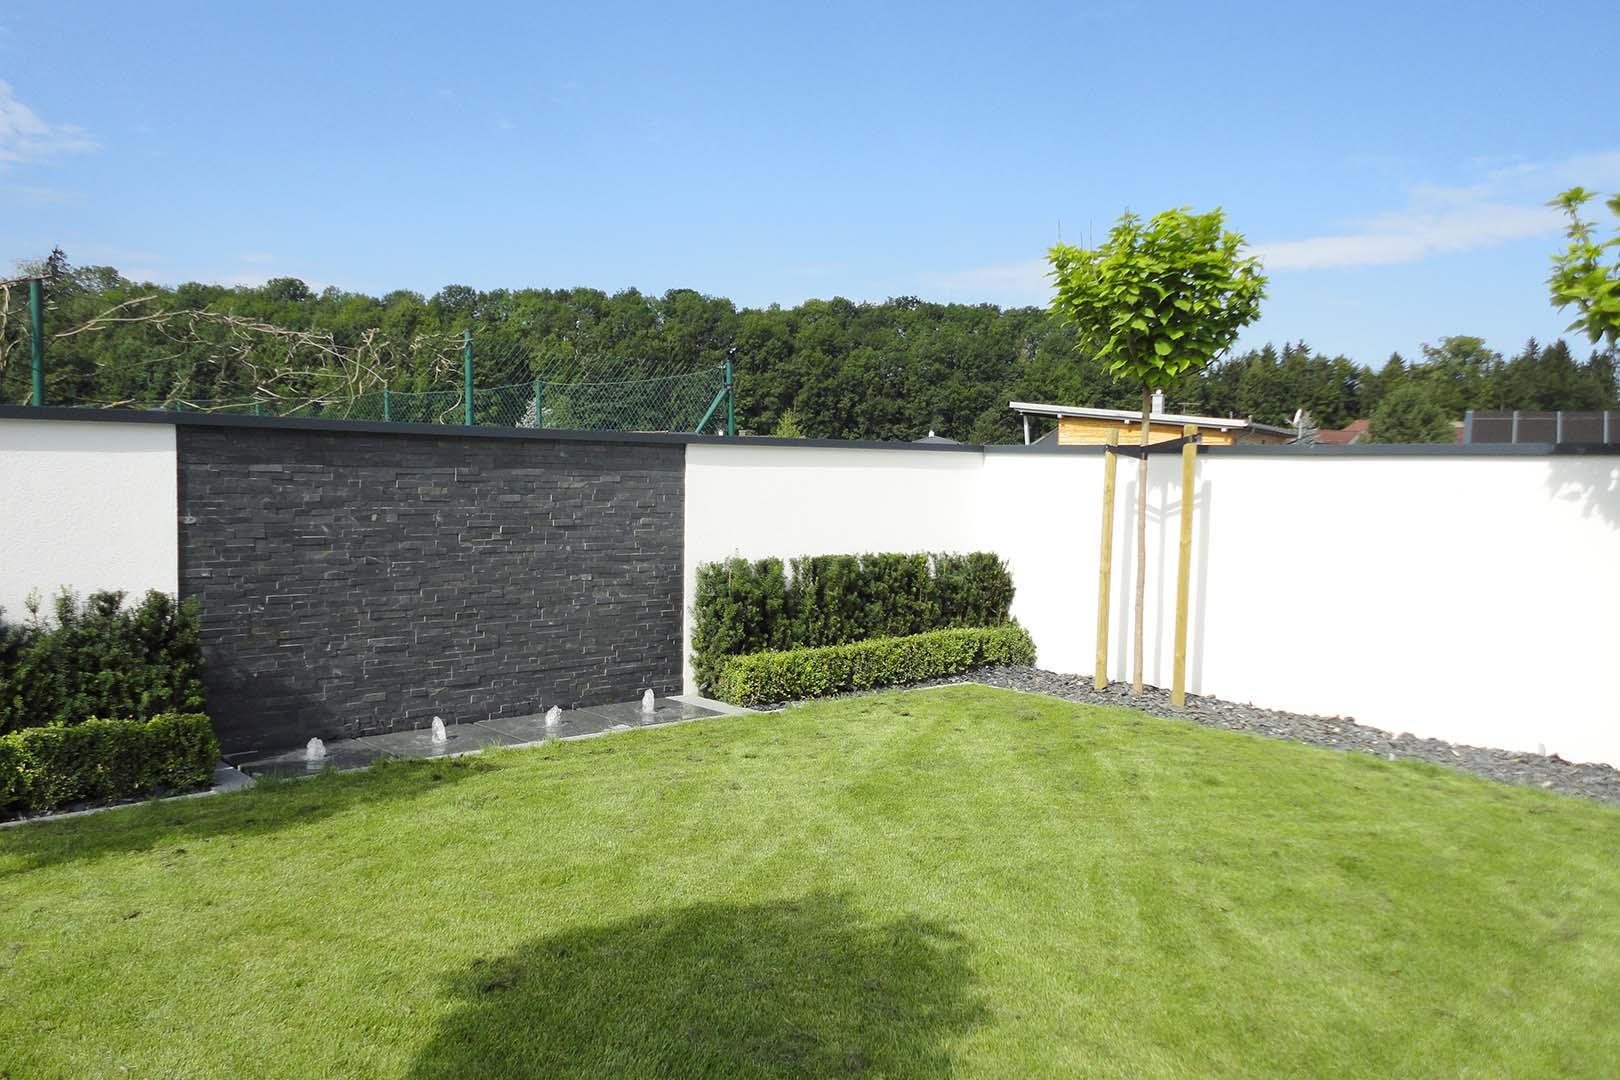 Gartengestaltung Springbrunnen